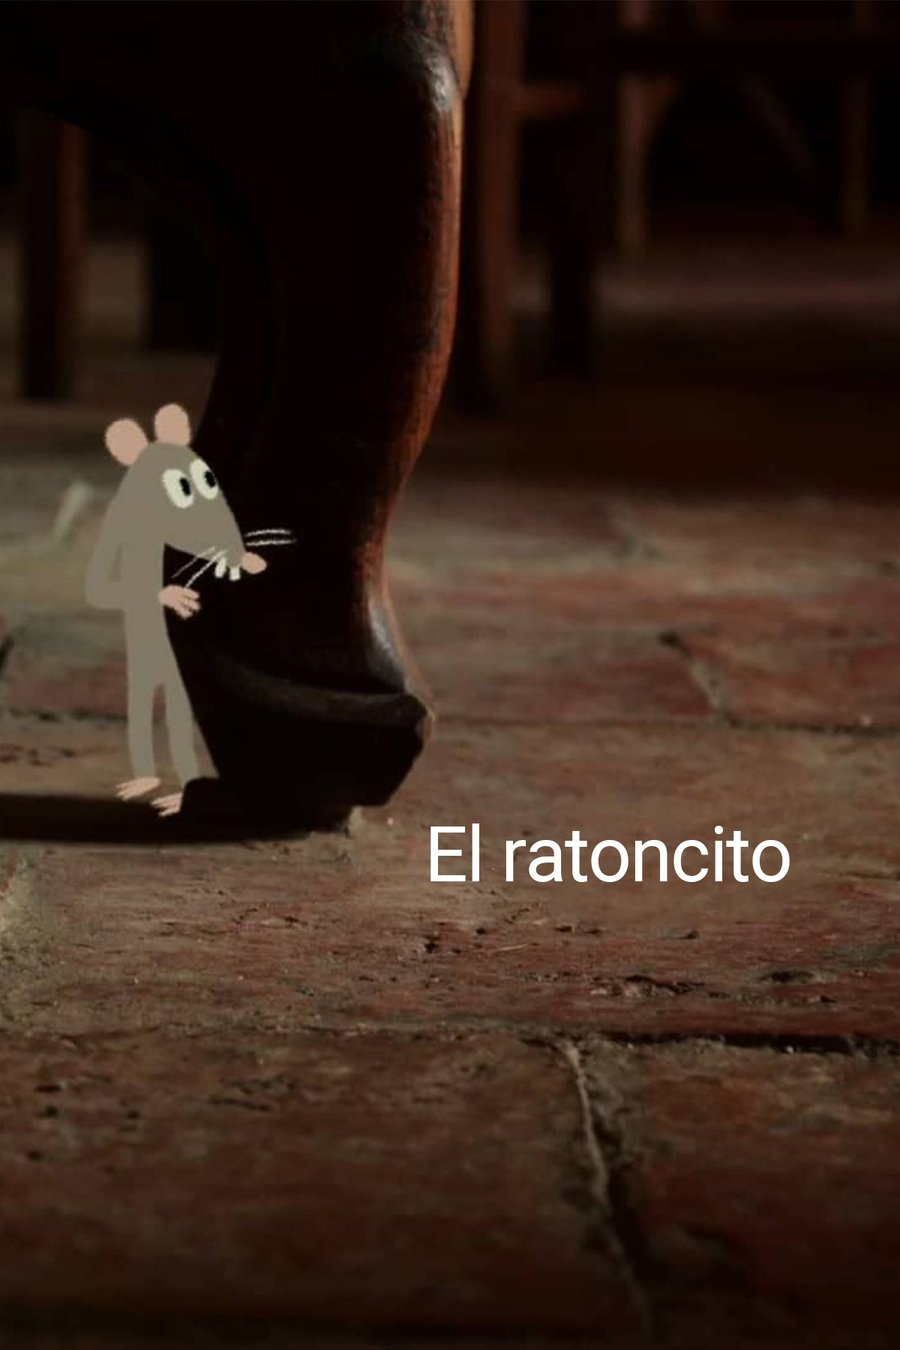 El ratoncito